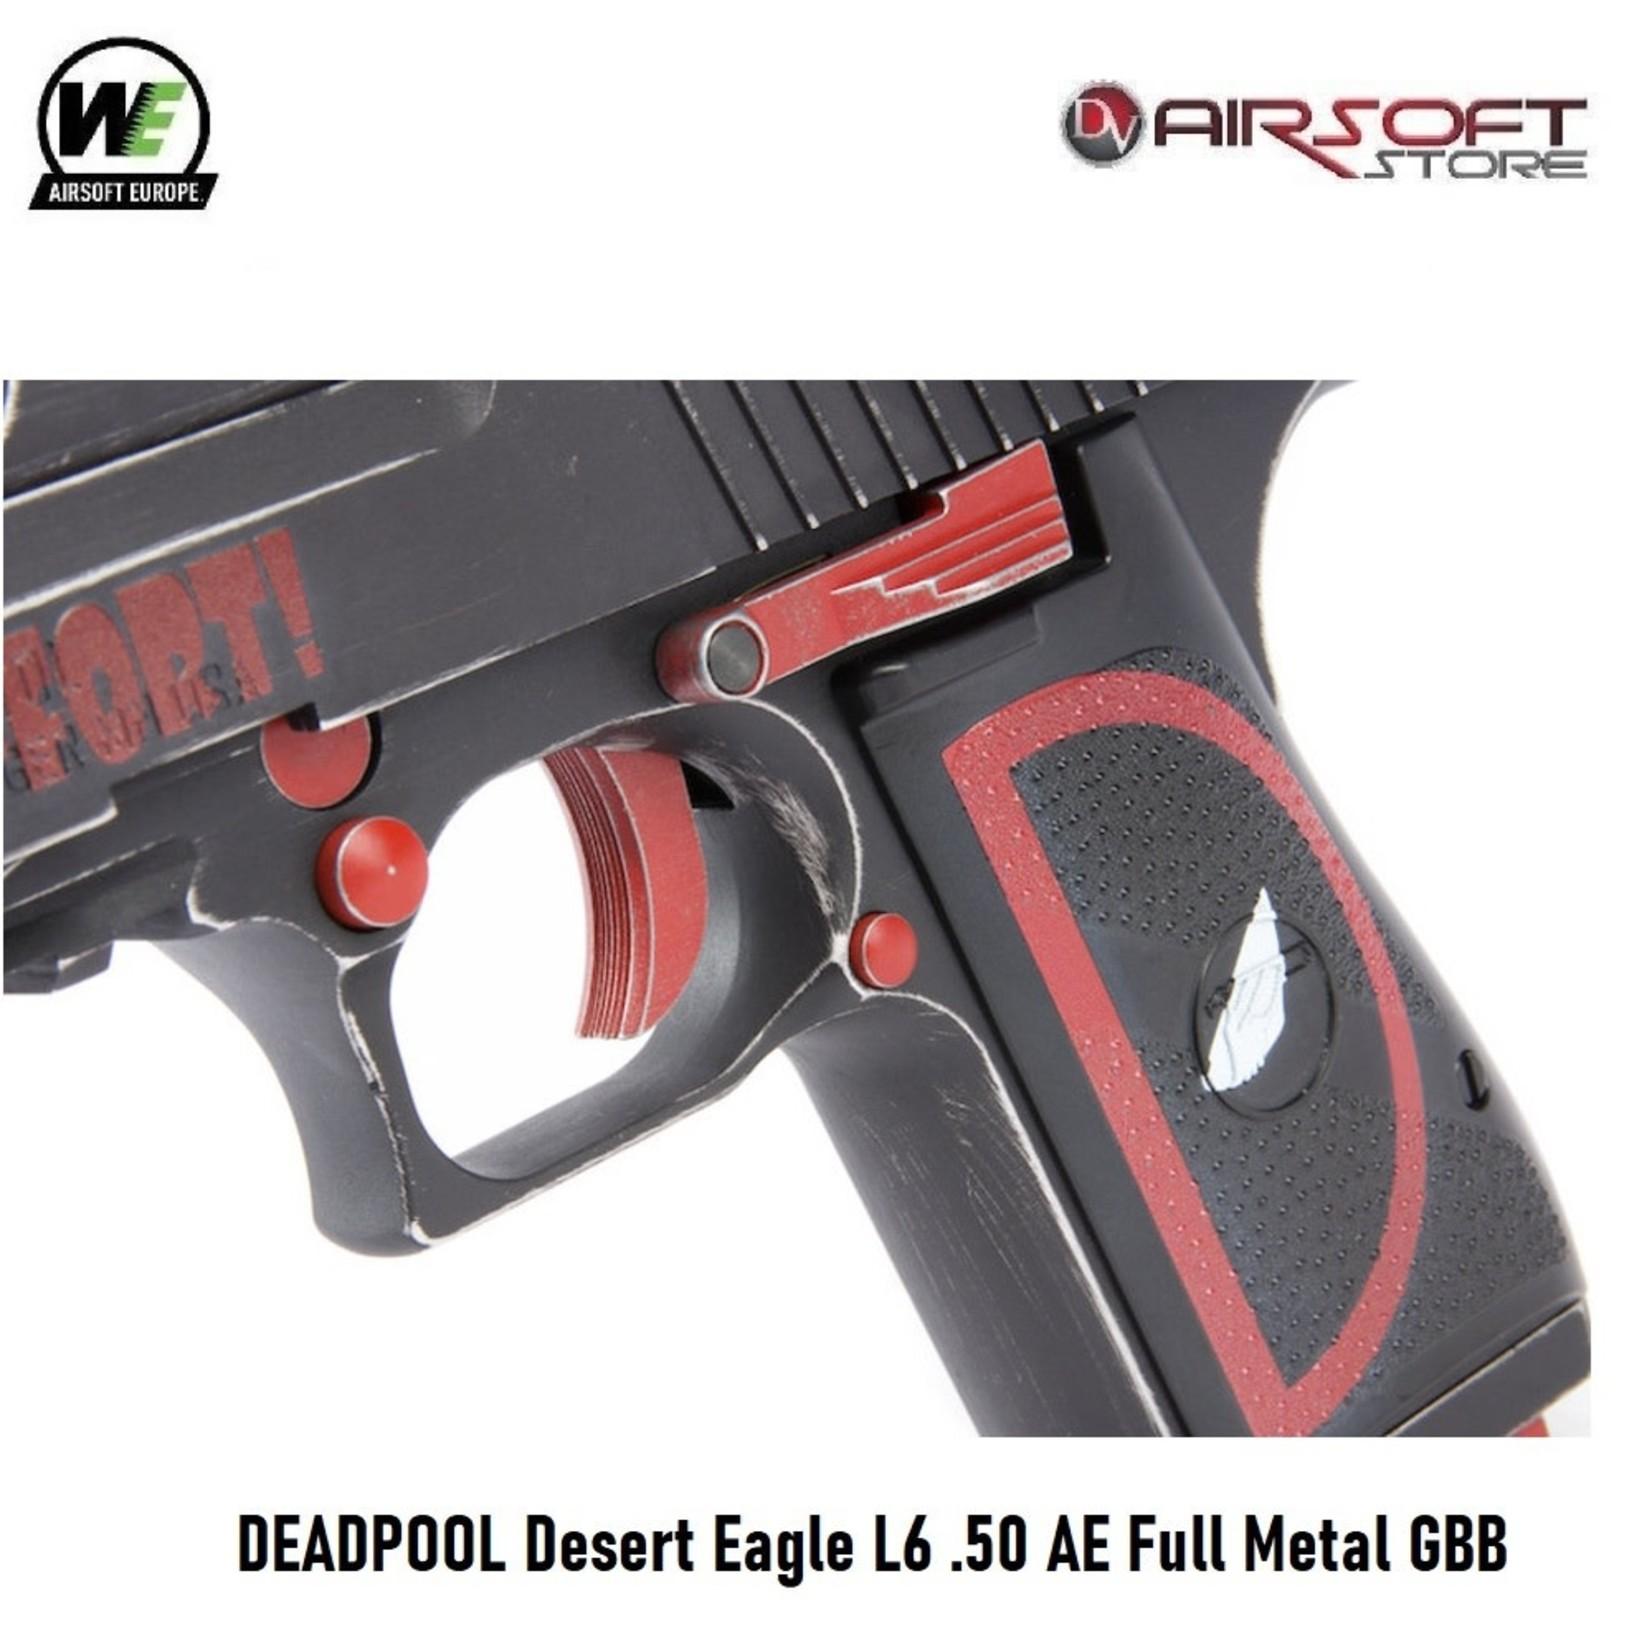 WE (Wei Tech) DEADPOOL Desert Eagle L6 .50 AE Full Metal GBB